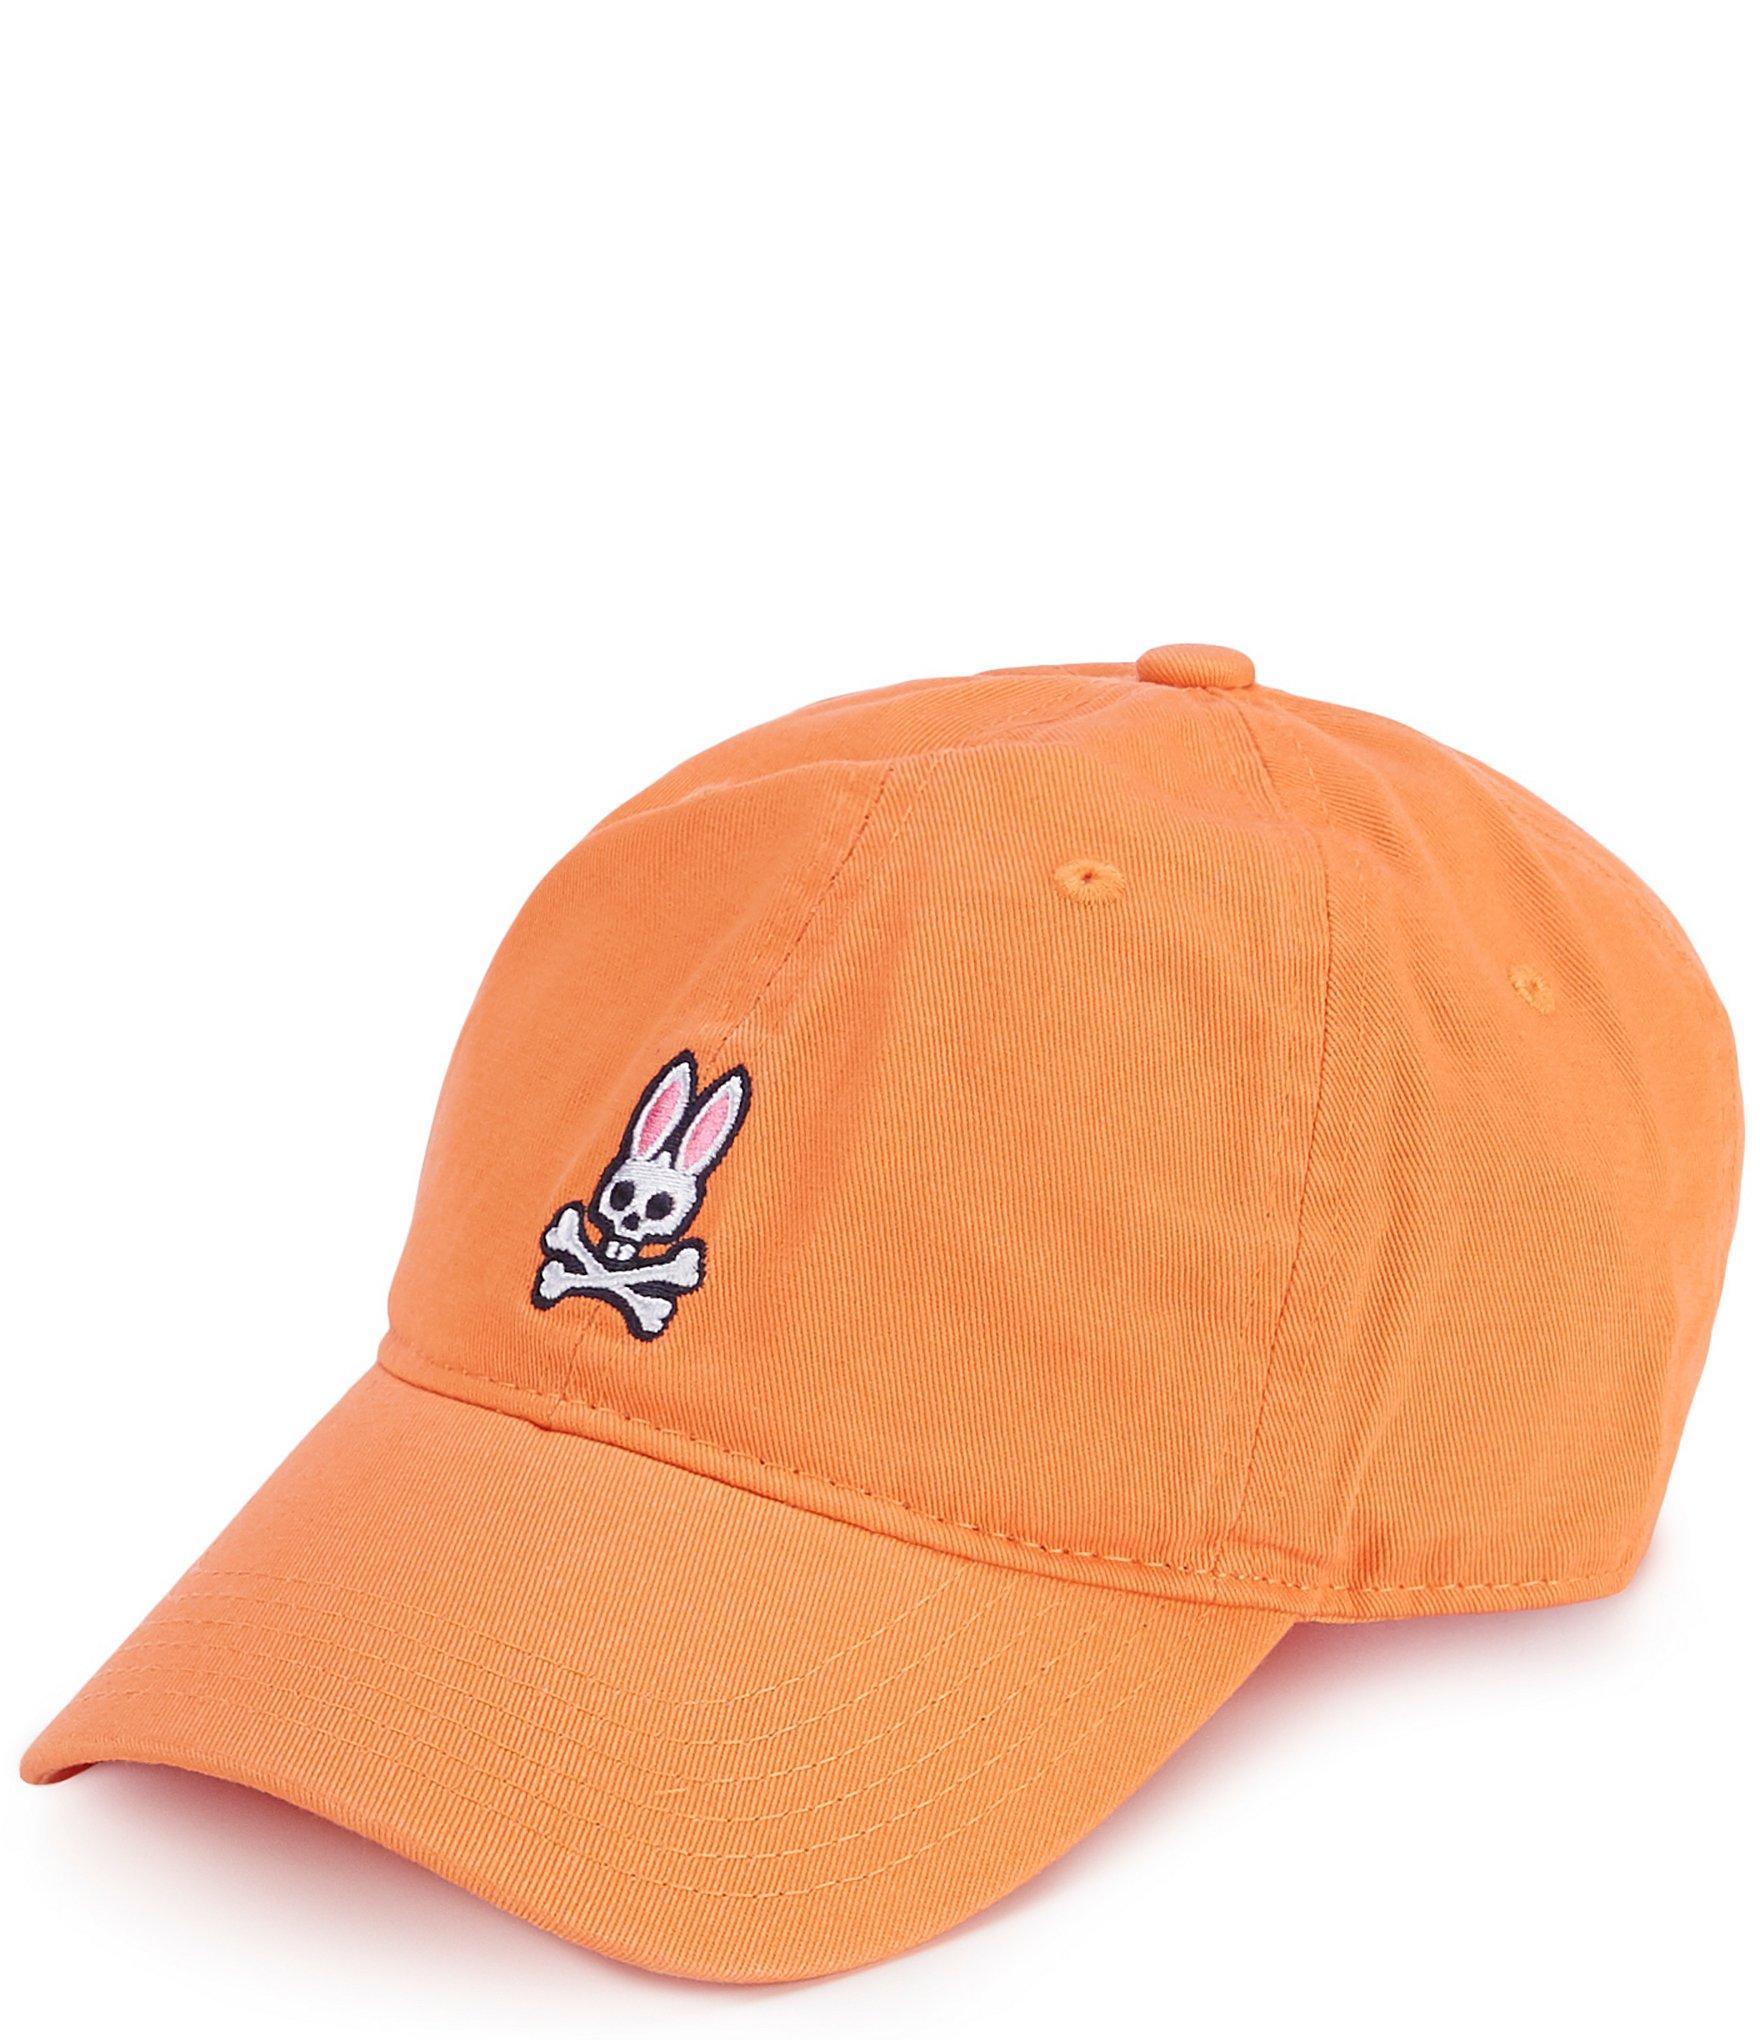 Lyst - Psycho Bunny Classic Stonewash Hat in Orange for Men f5103a5966c5